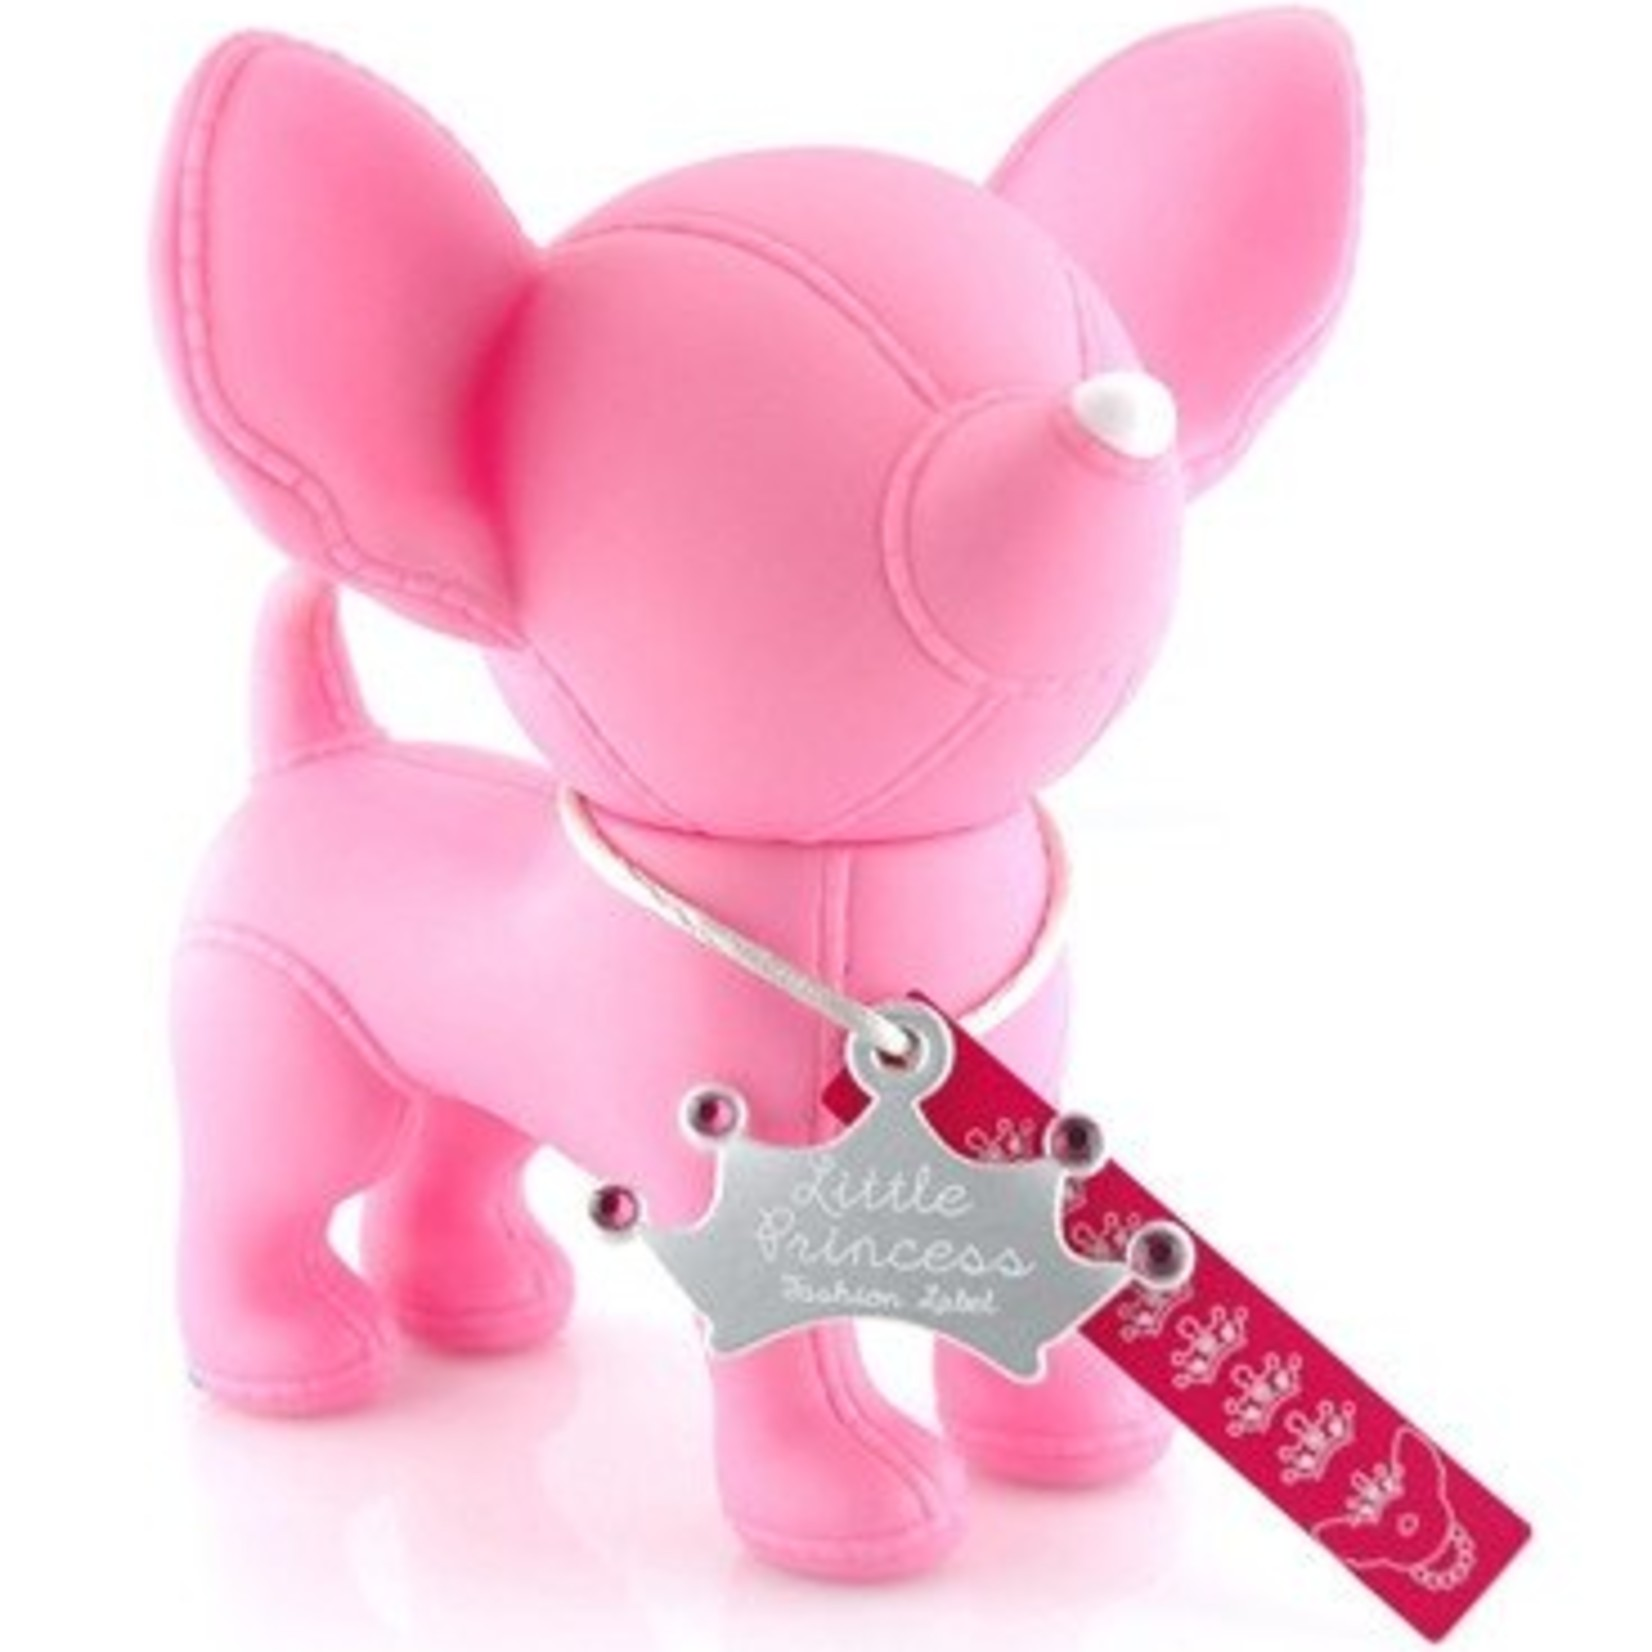 Spaarpot Whaawhaa Princess Fashion roze